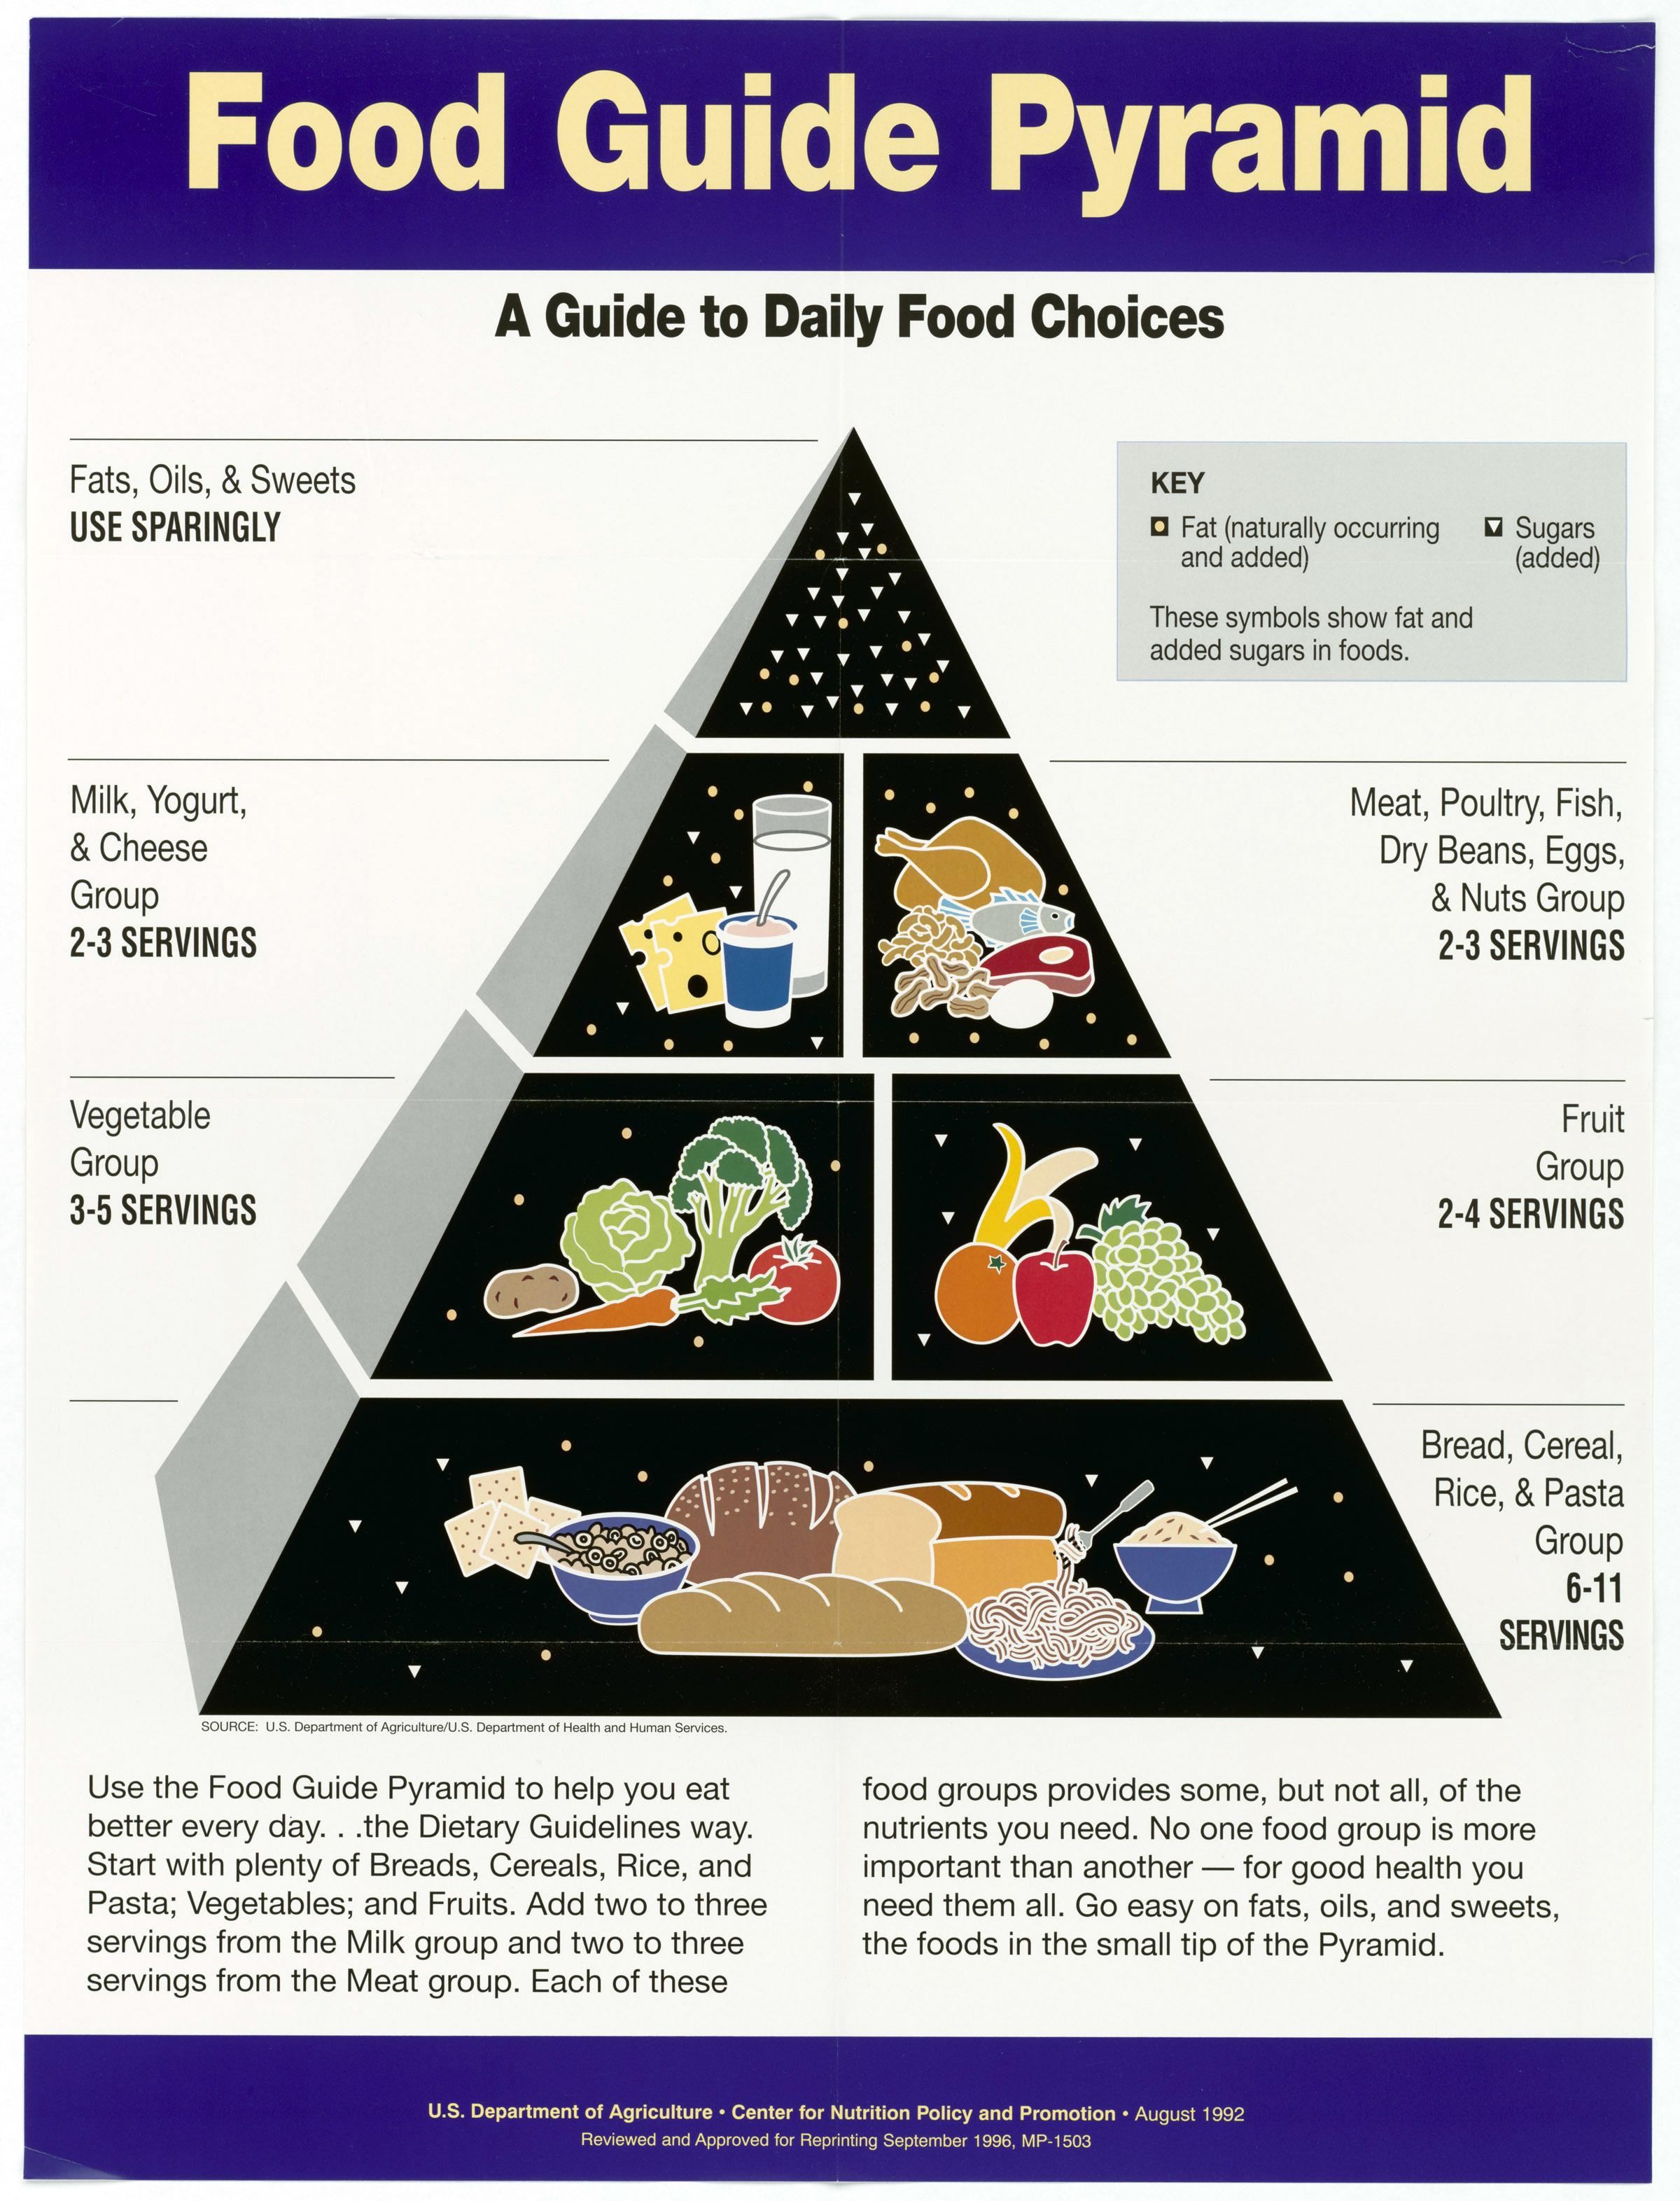 USDA 2015 Dietary Pyramid - Ultimate Health Personal Training Center - Los Angeles